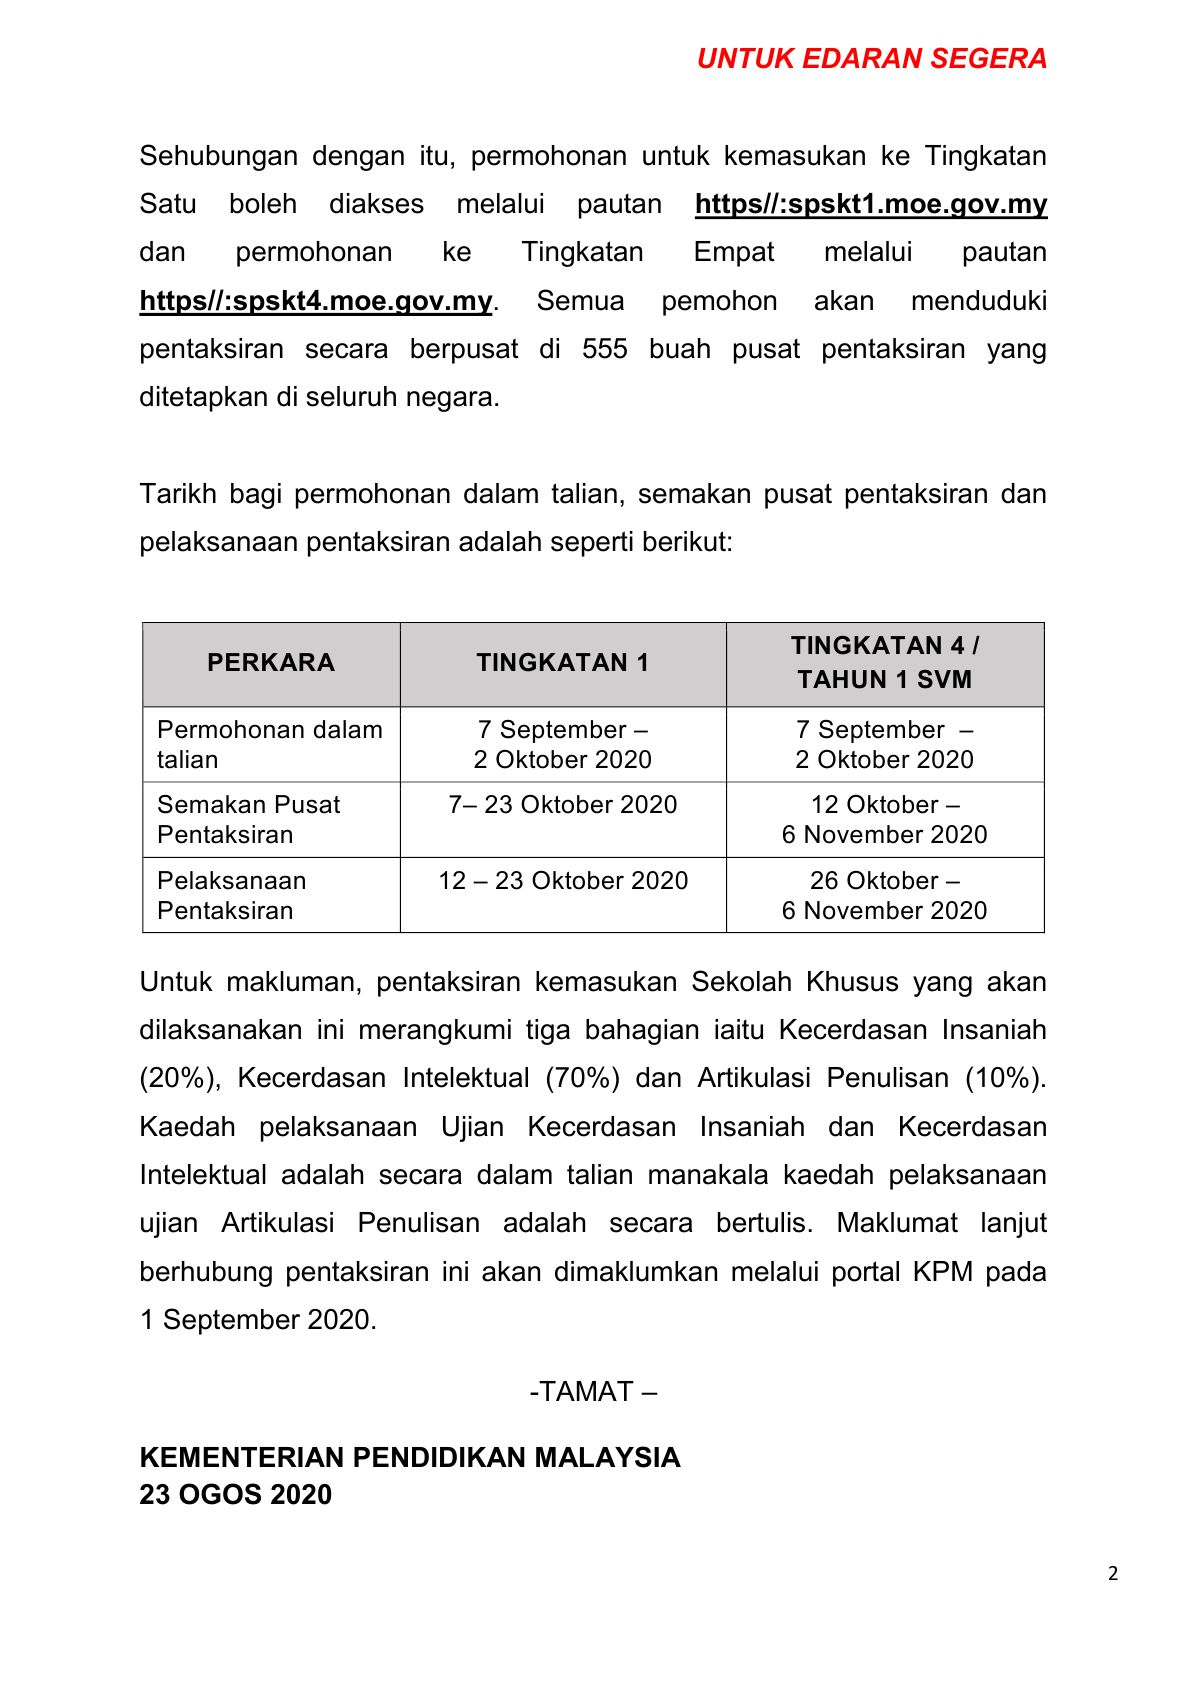 KPM KENYATAAN MEDIA PENTAKSIRAN BAHARU KEMASUKAN SEKOLAH KHUSUS TAHUN 20211